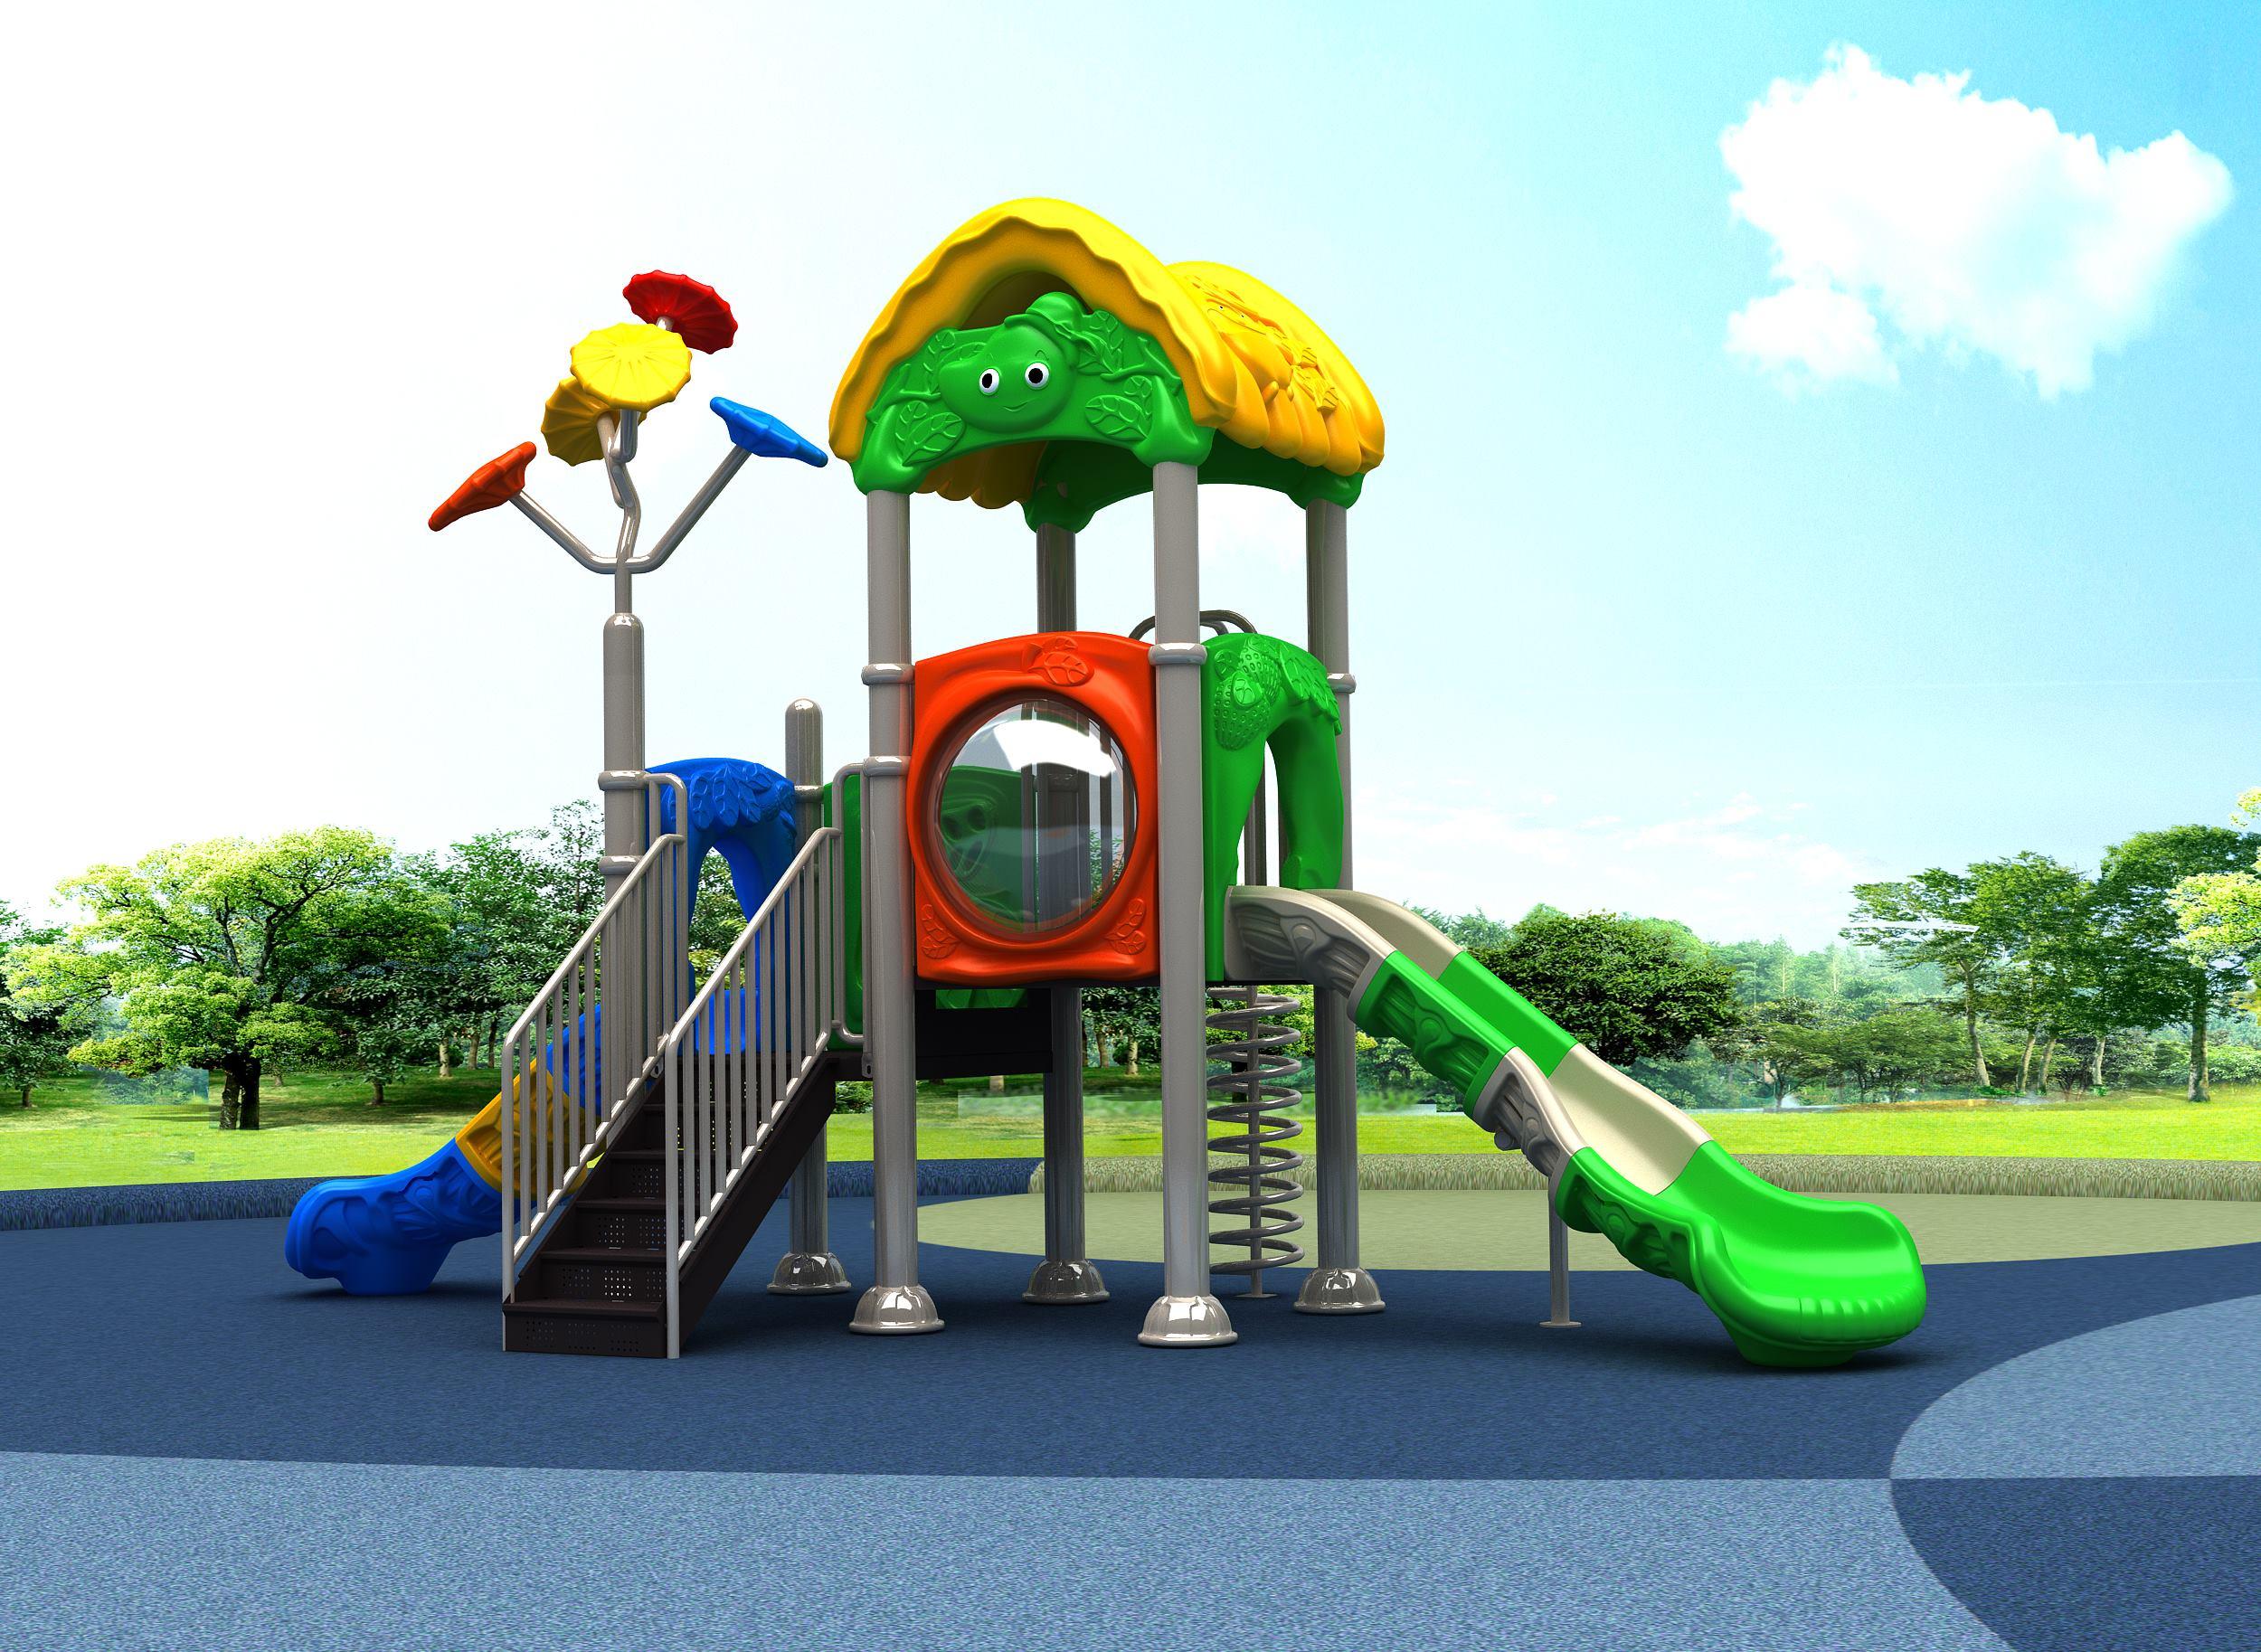 SOZA PlayGround parques infantiles juegos para niños parques plásticos parques plasticos parques infantiles bogota parques infantiles bogotá parques infantiles colombia